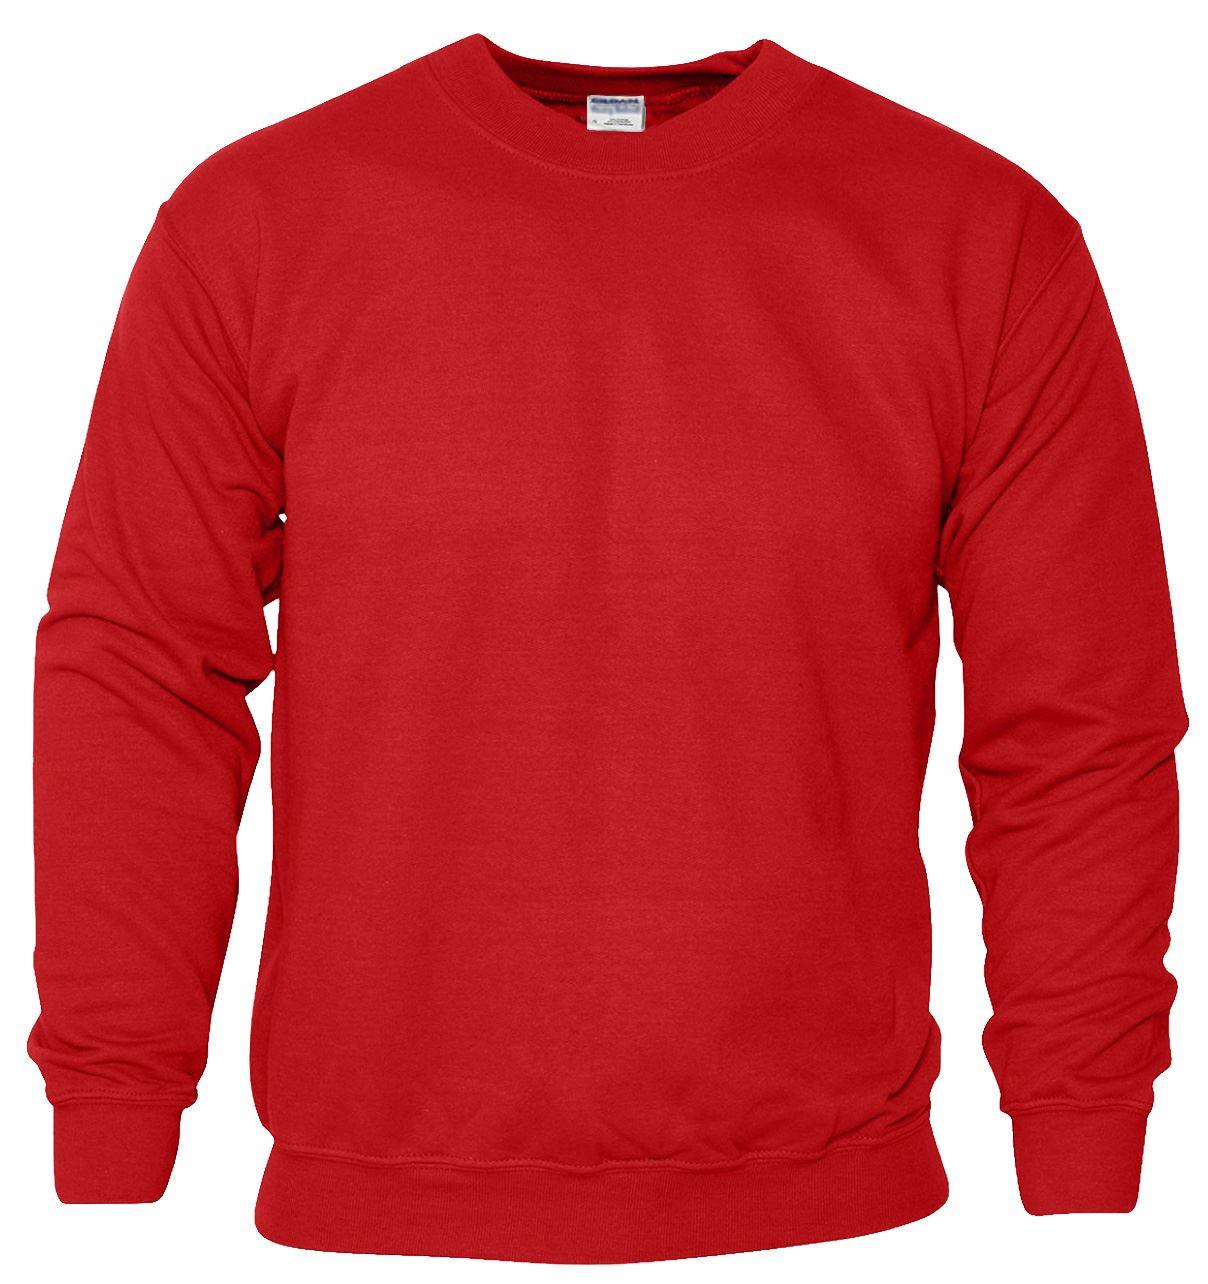 New Gildan Plain Sweatshirt Cotton Heavy Blend Crew Neck ...